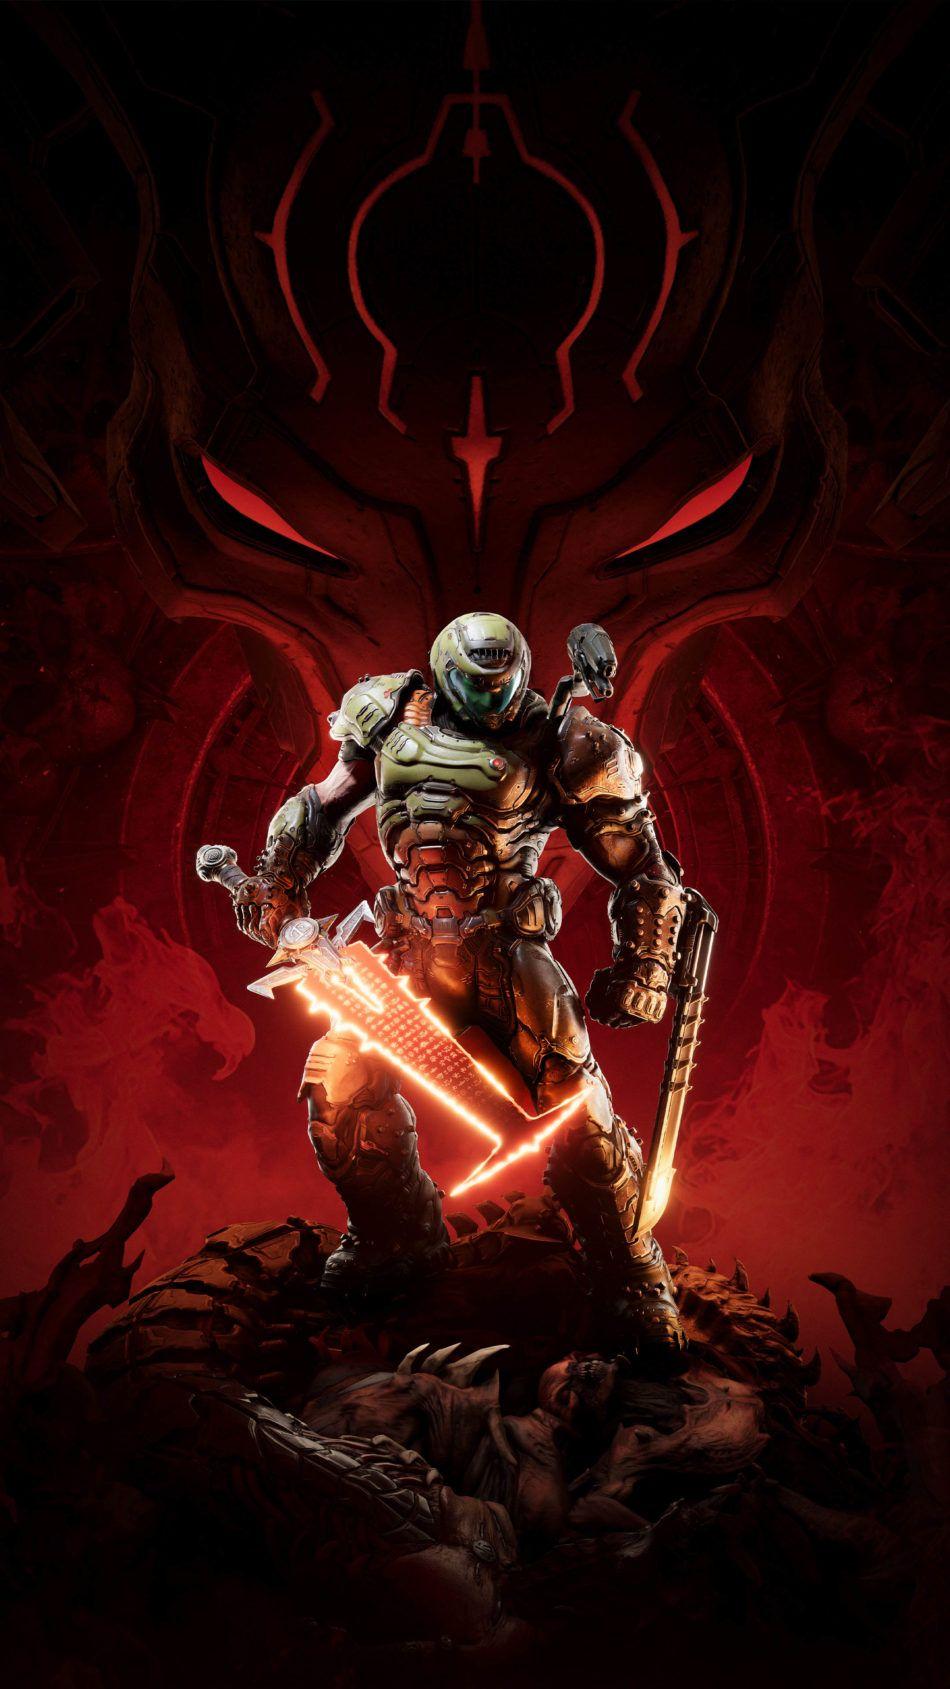 Doom Eternal Game 2020 4k Ultra Hd Mobile Wallpaper In 2020 Doom Demons Doom Videogame Doom Game